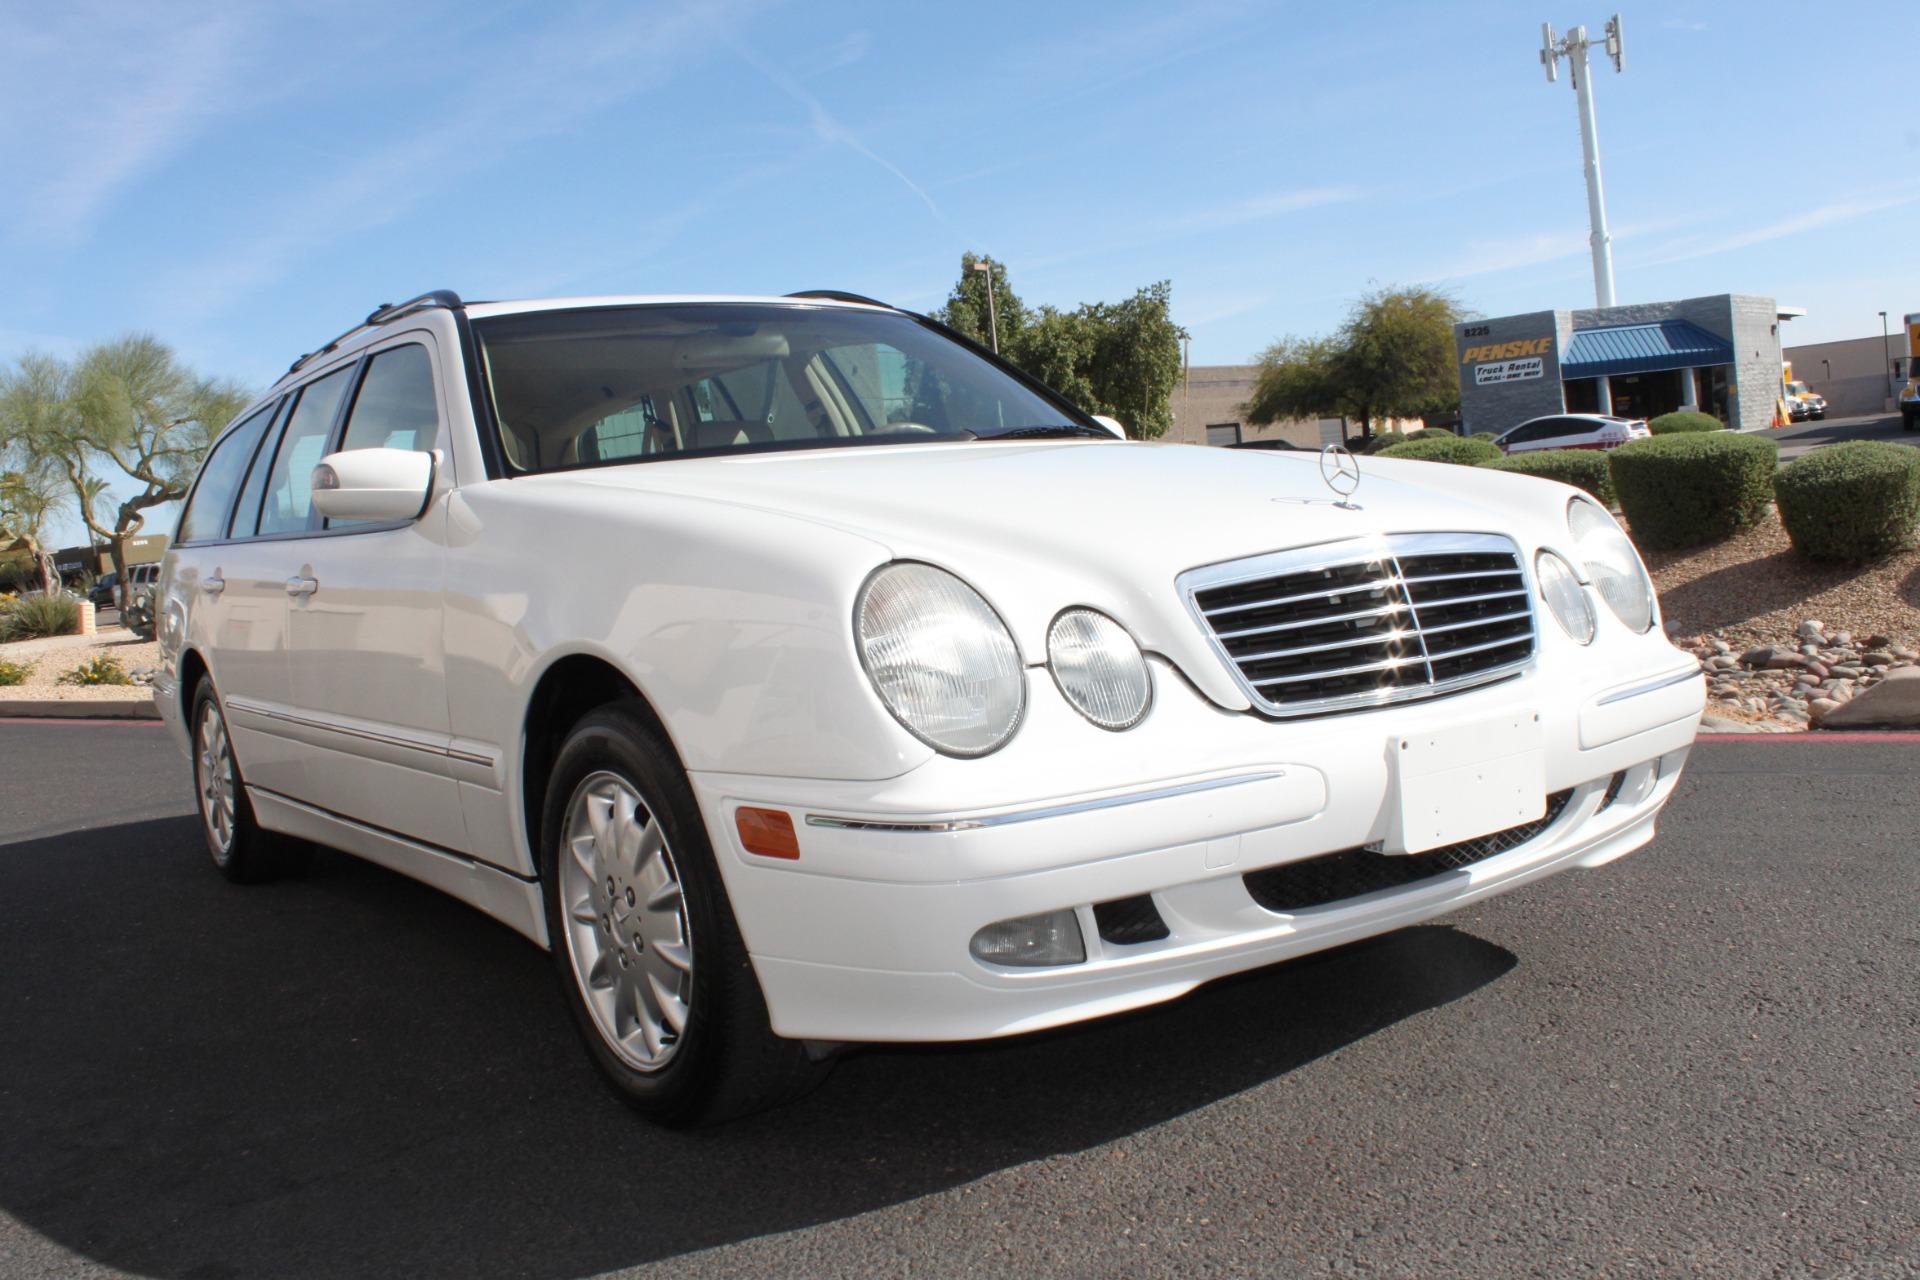 Used-2000-Mercedes-Benz-E-Class-Wagon-Cherokee